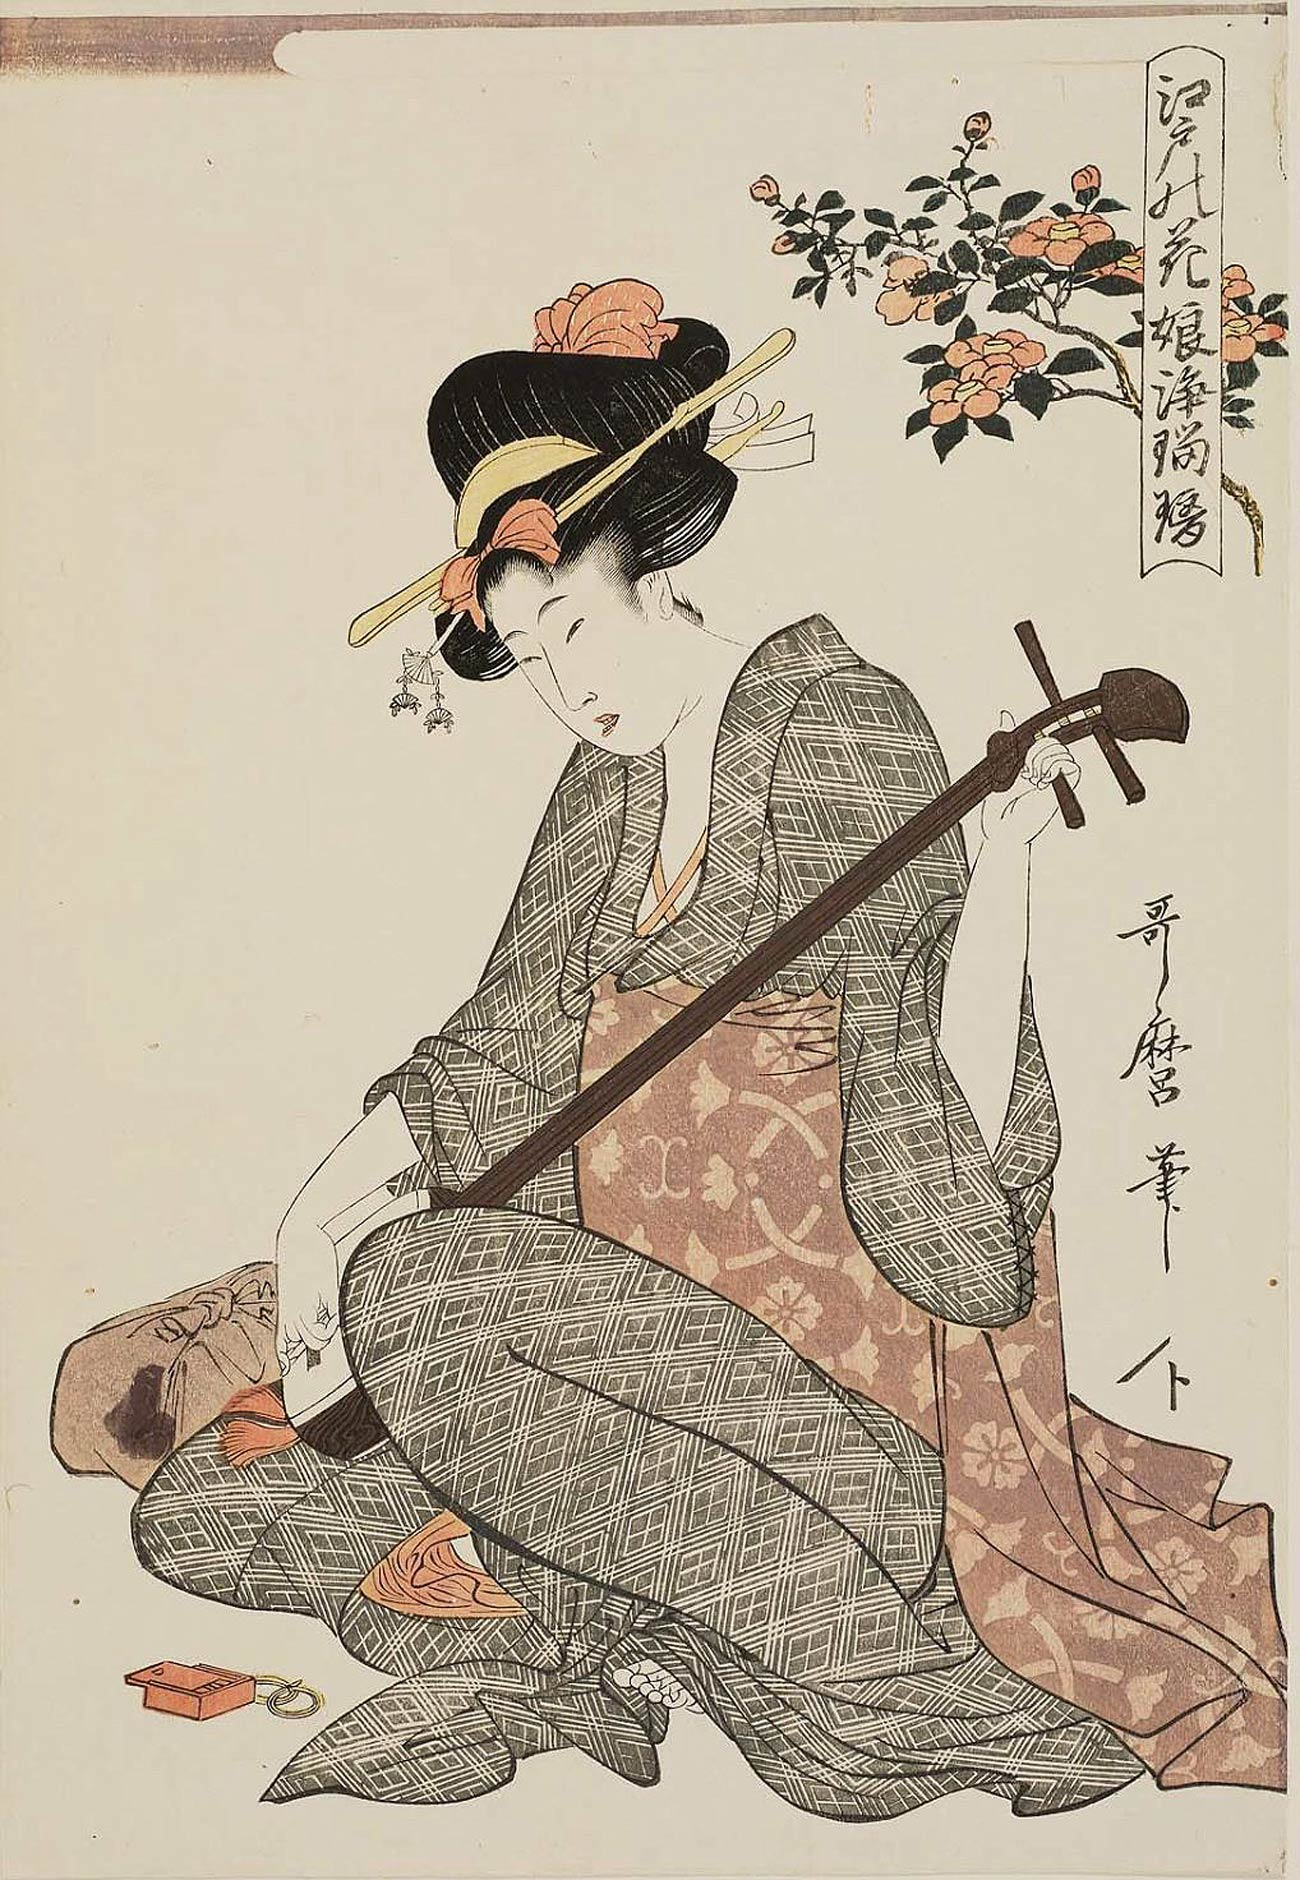 Geisha-Utamaro dans Silhouettes